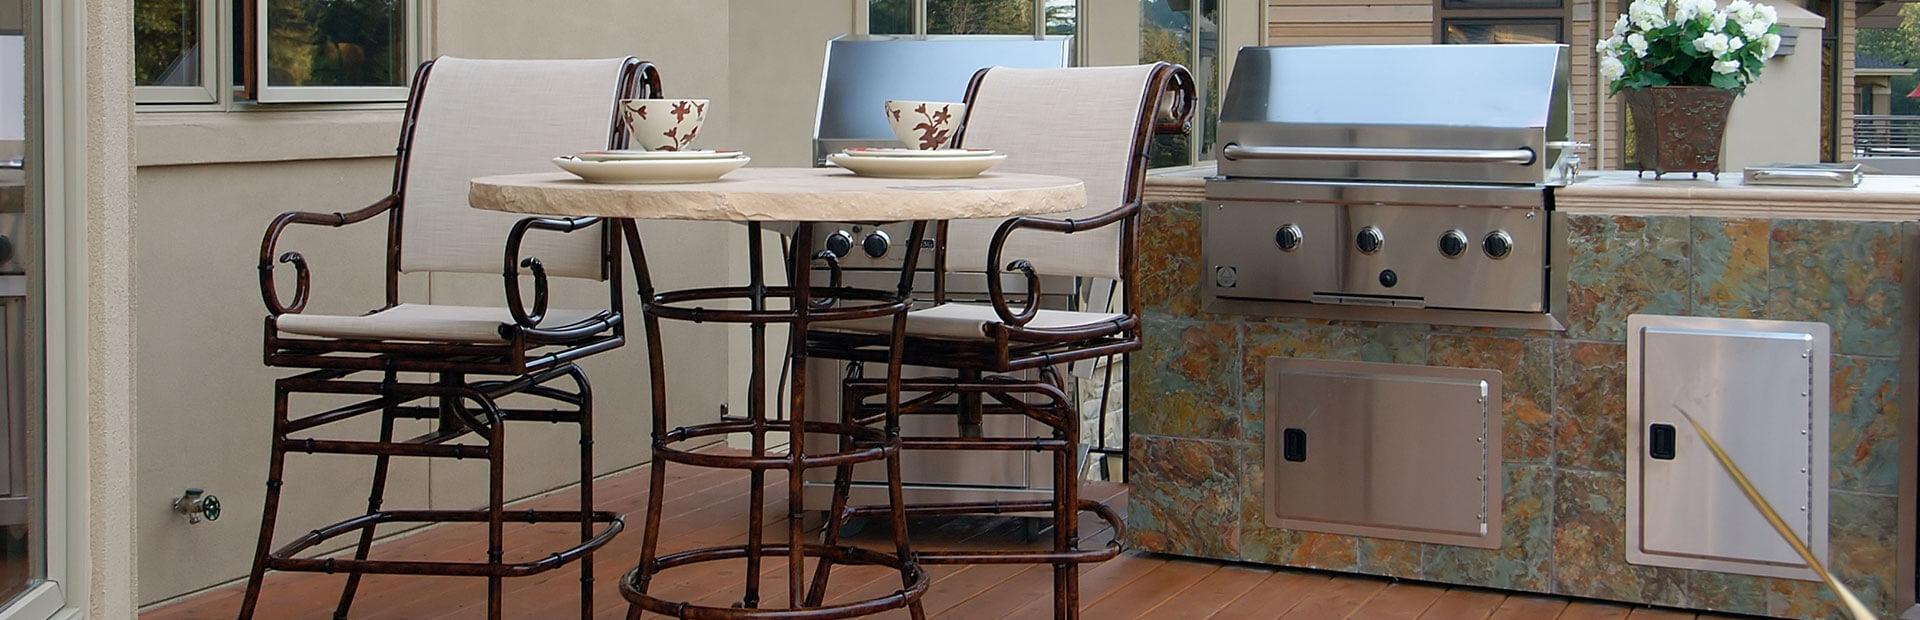 Outdoor Kitchens - Southlake, Keller, Trophy Club